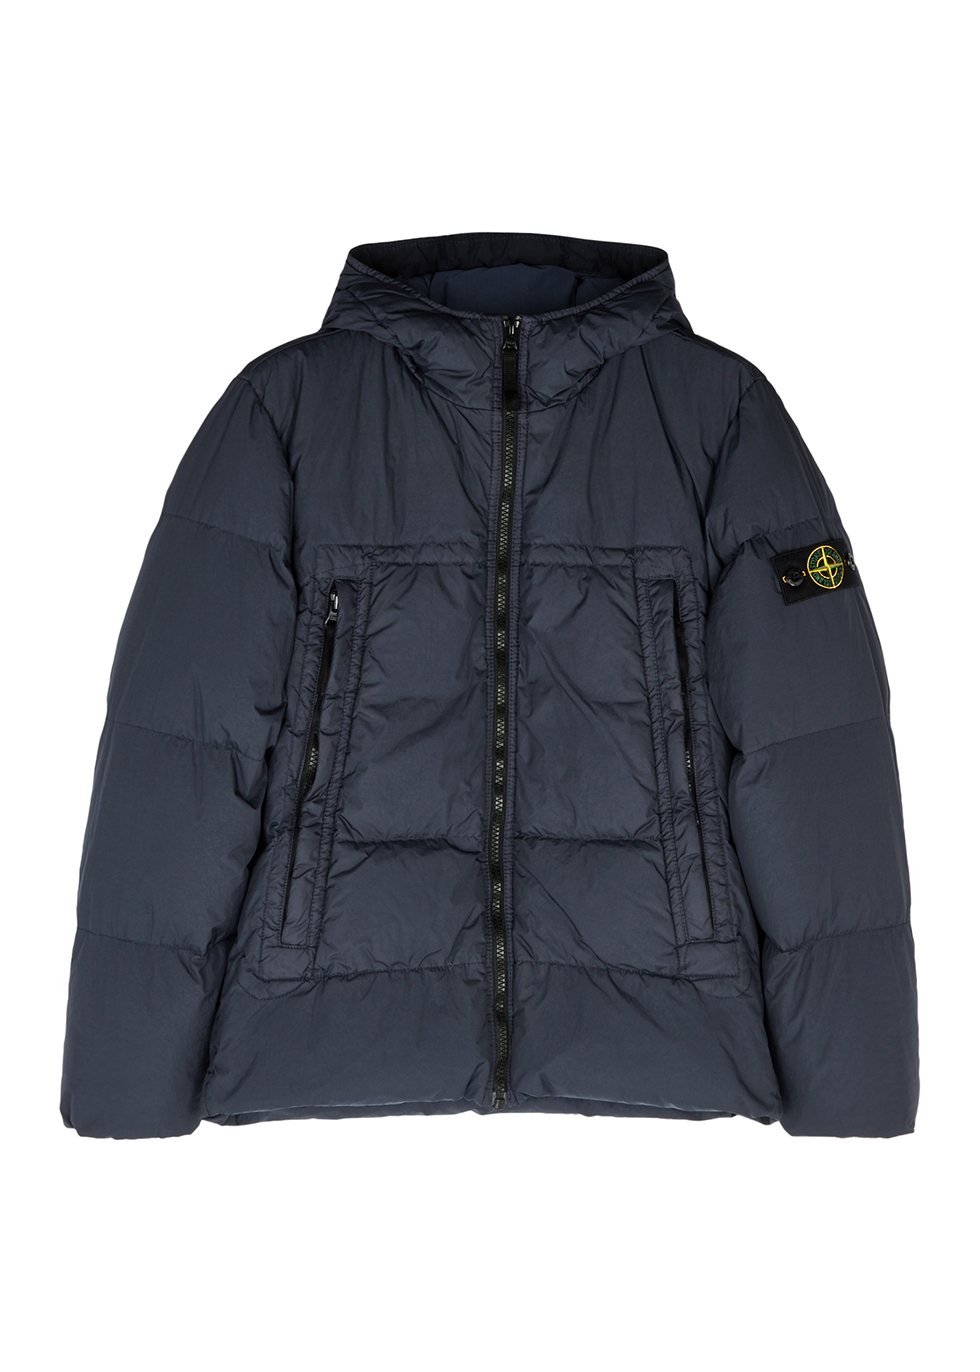 Crinkle Reps navy shell coat (10-12 years)